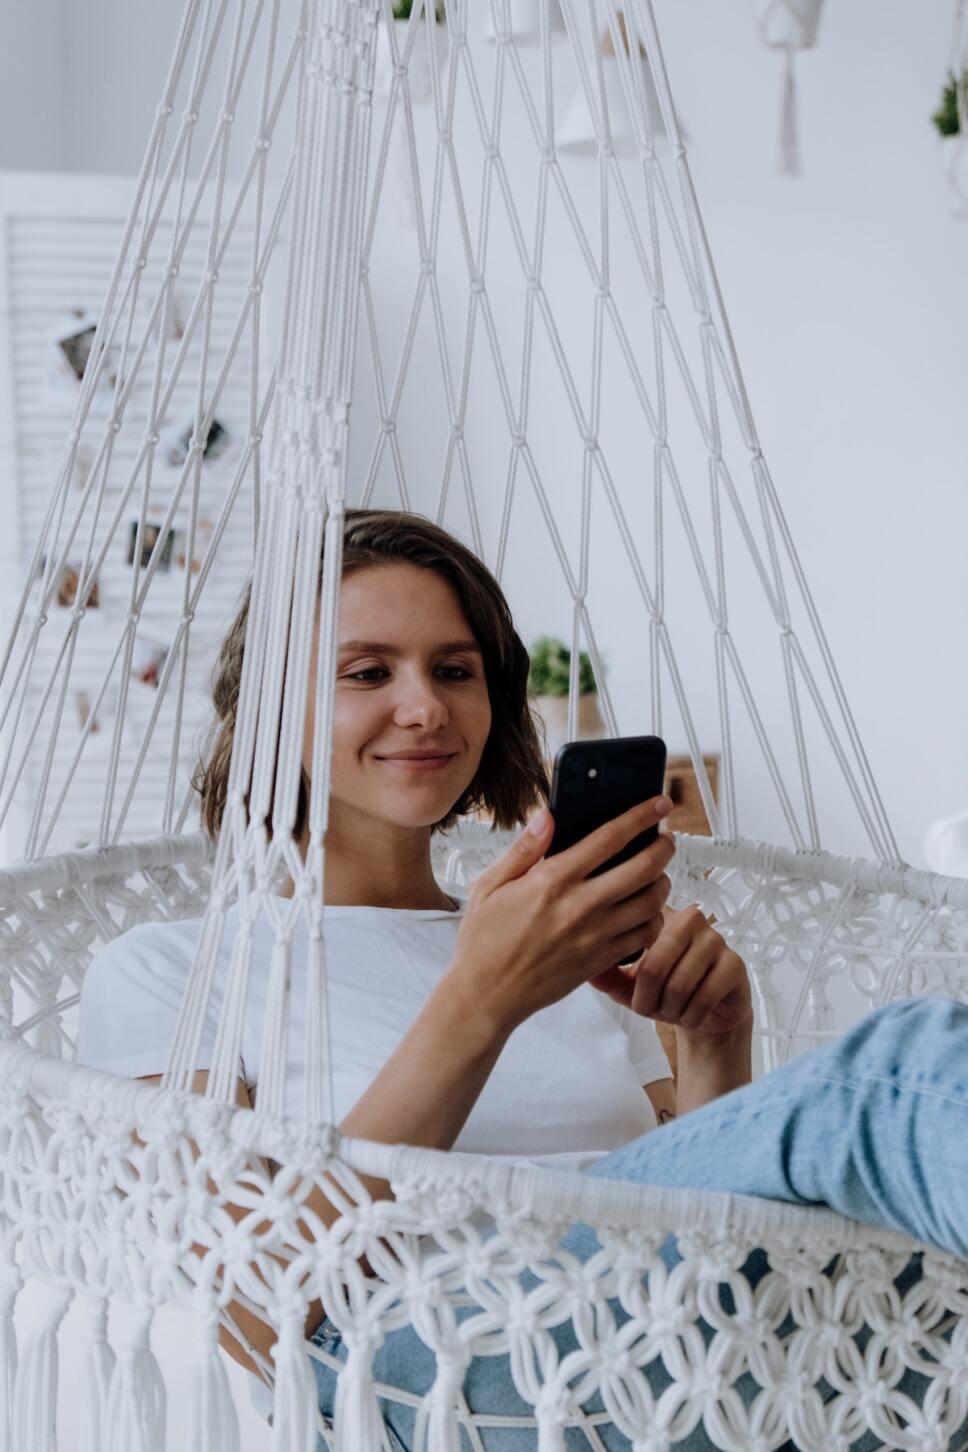 mujer-en-su-celular-whatsapp.jpg